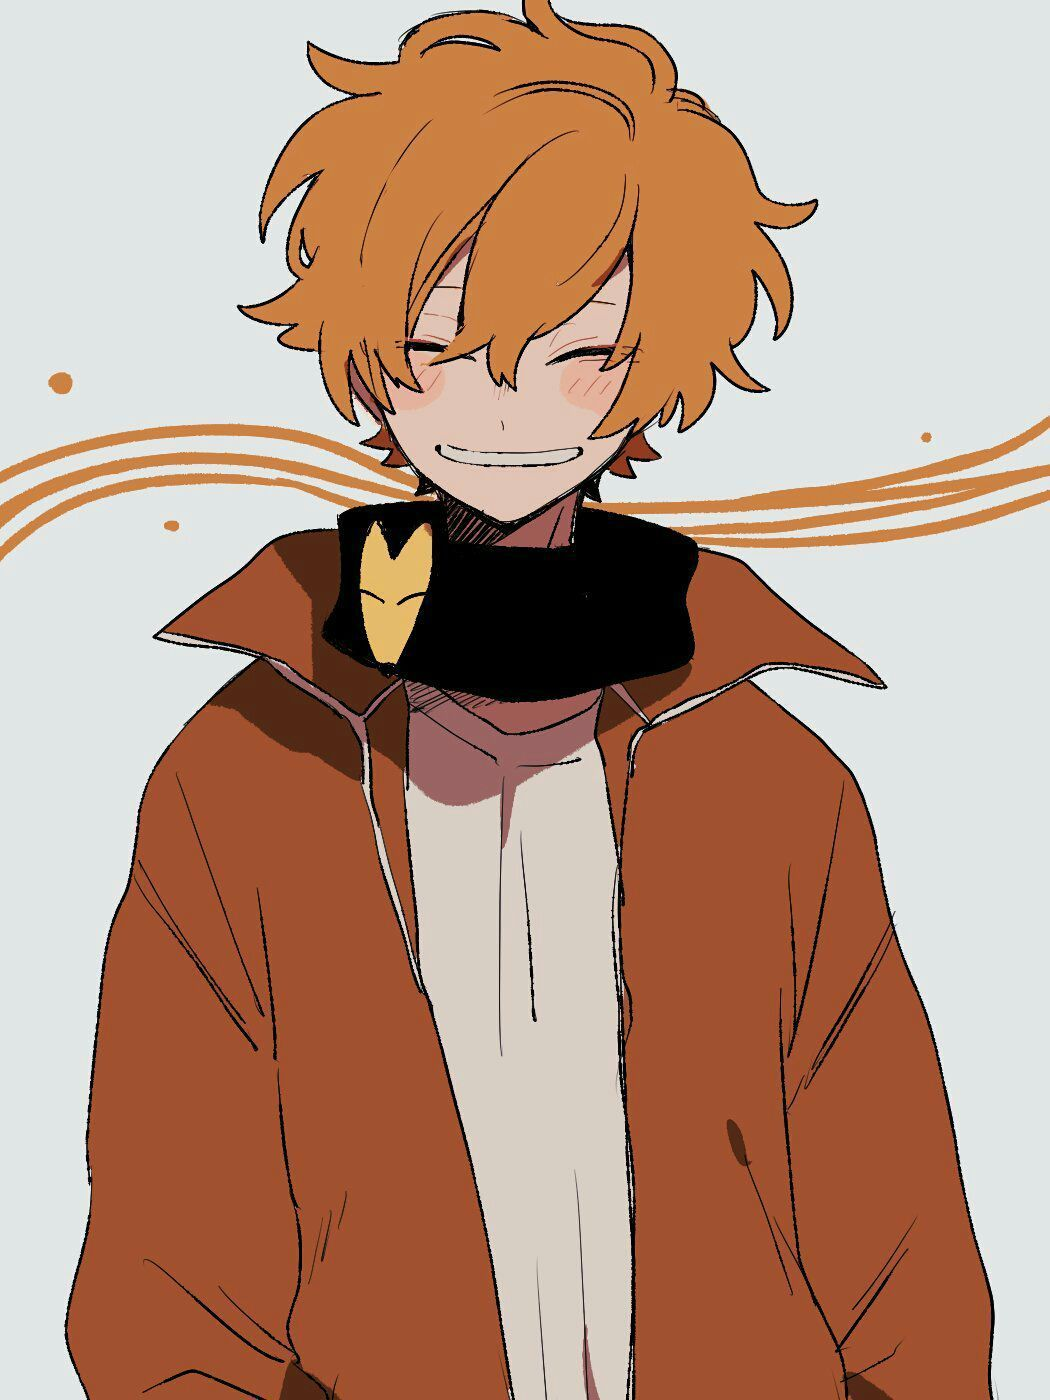 Un Latinoamericano Latinoamericano Un Anime Drawings Boy Anime Boy Hair Cute Anime Character